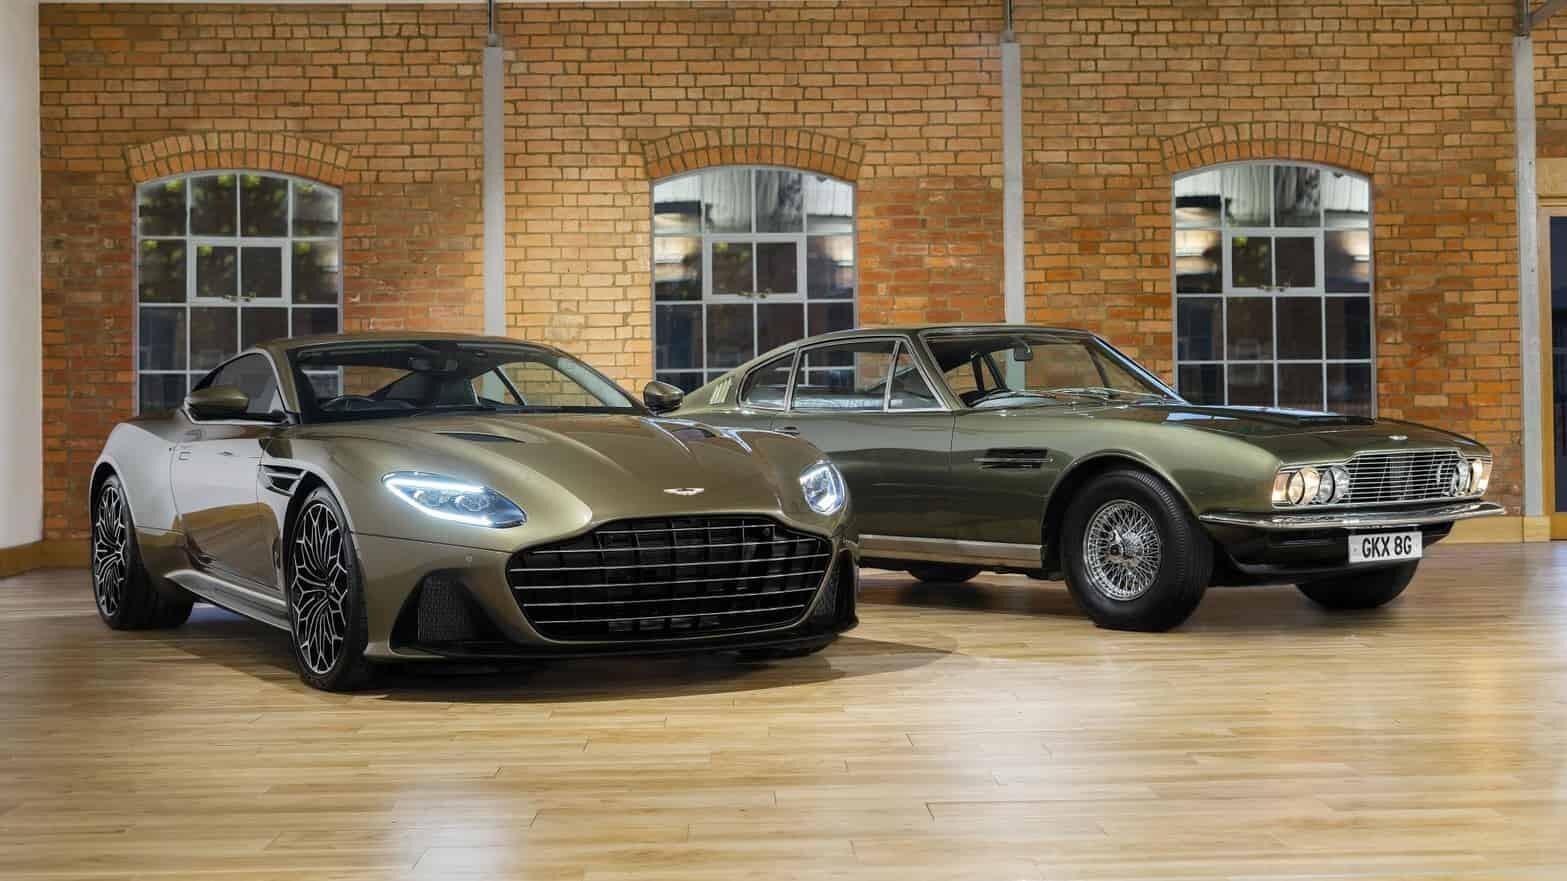 Aston has built a Bond-themed DBS Superleggera